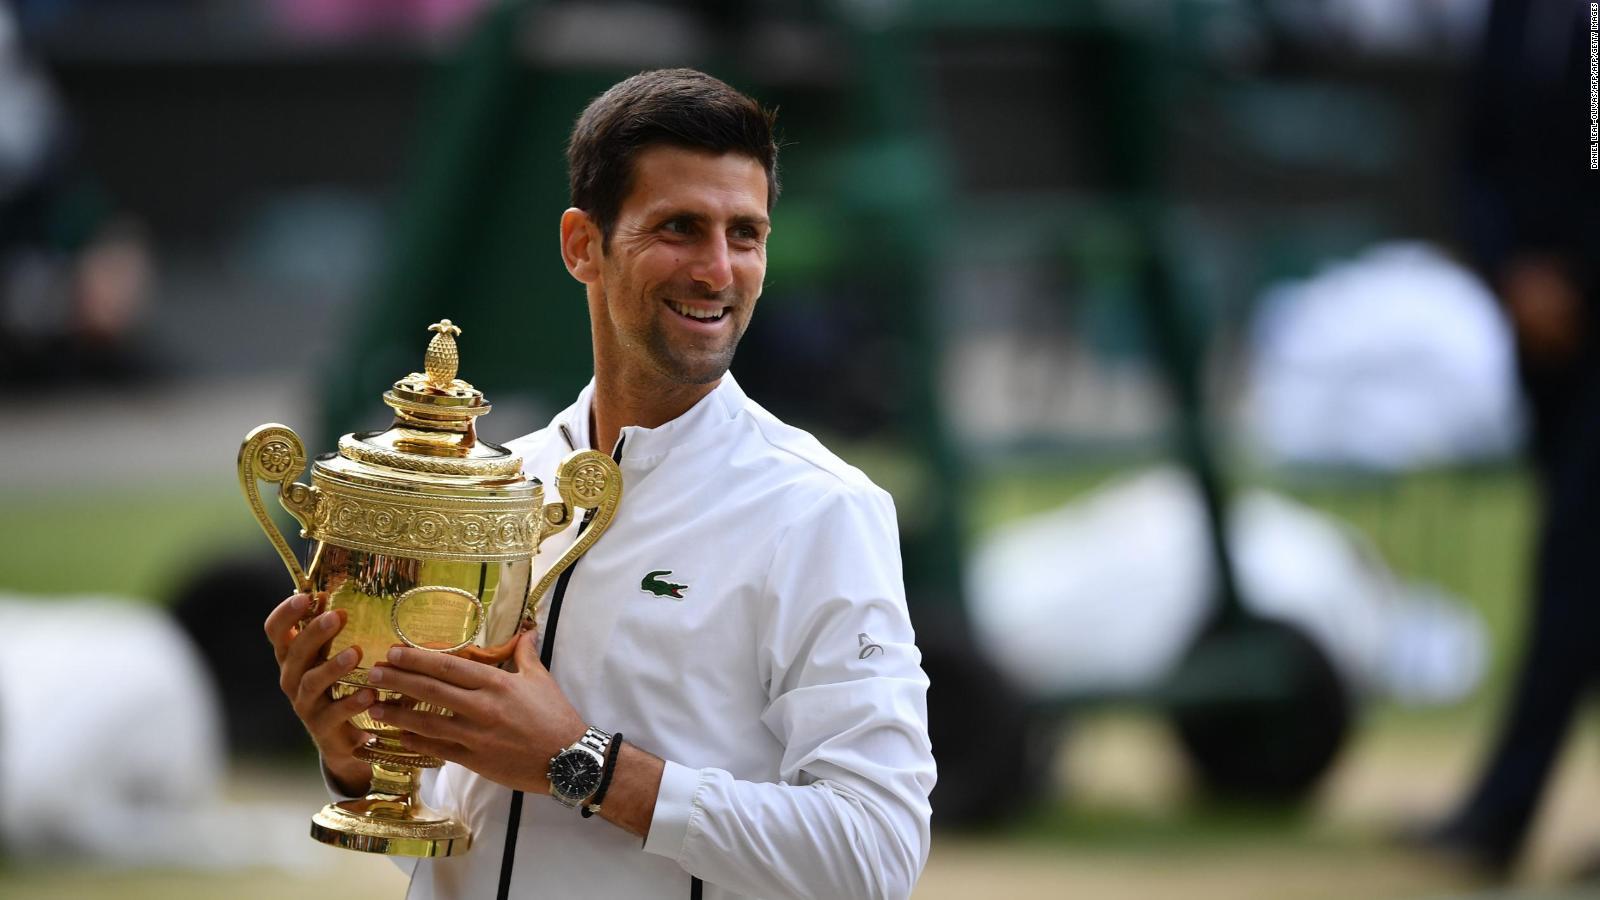 Novak Djokovic Pays Tribute To Kobe Bryant After Australian Open Victory Cnn